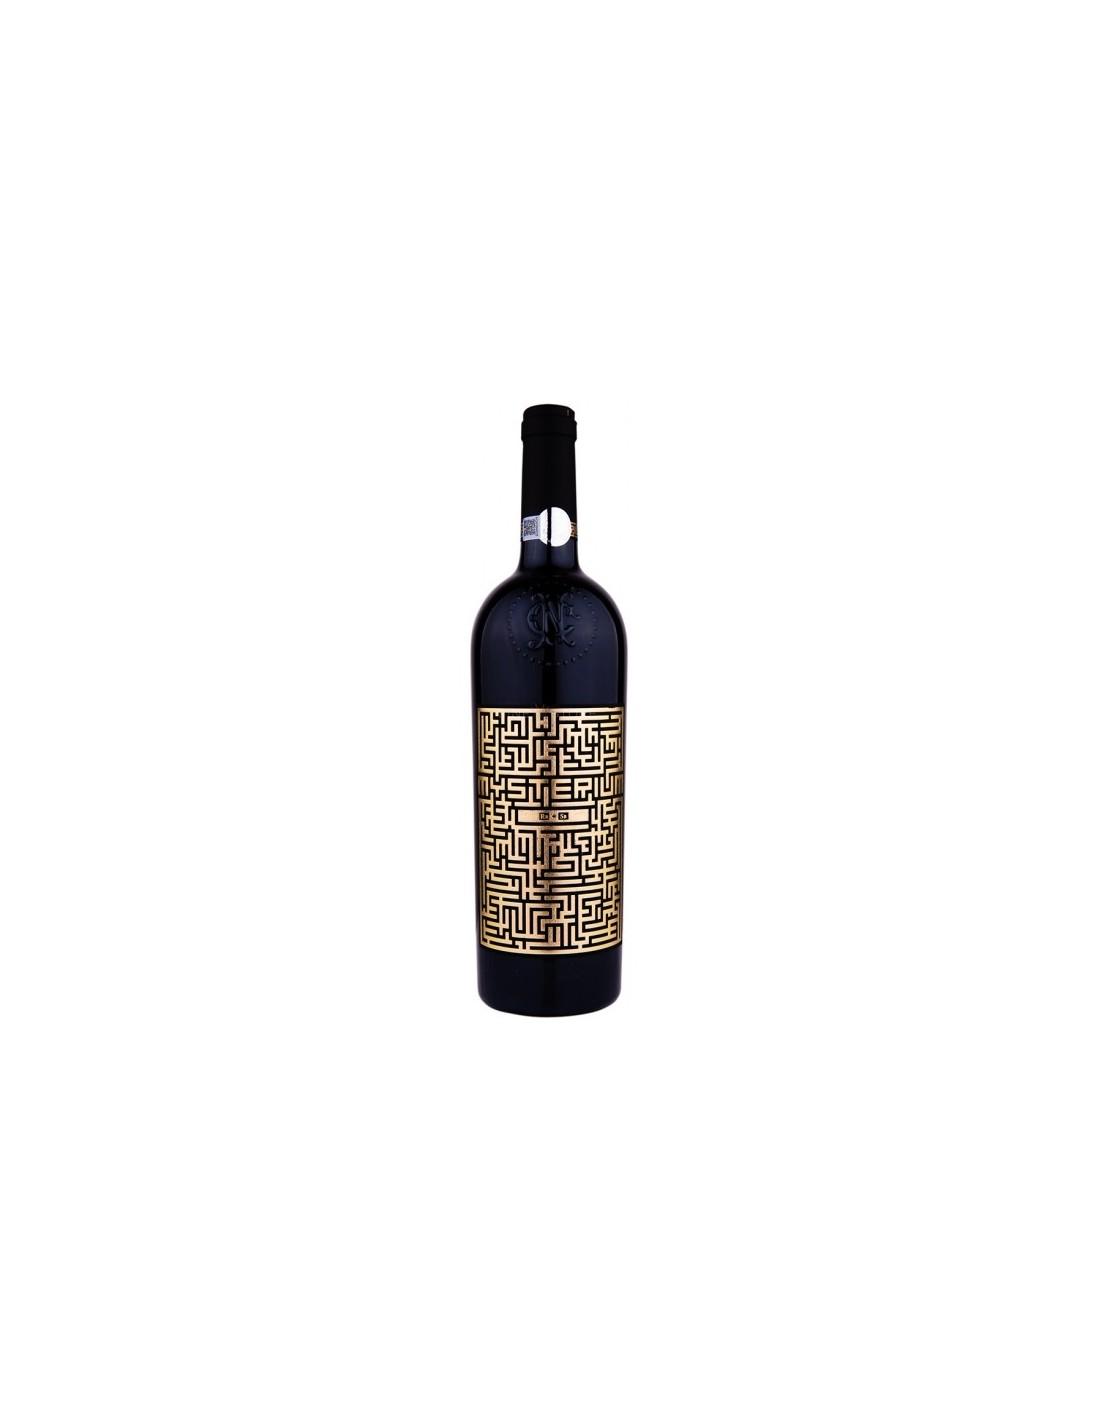 Vin alb sec, Riesling & Sauvignon Blanc, Jidvei Mysterium Tarnave, 0.75L, 12% alc., Romania